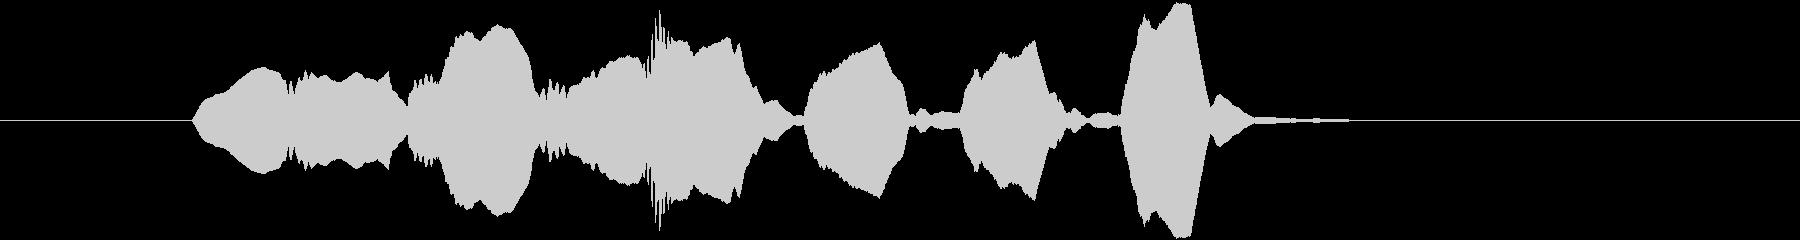 Youtubeオープニング風リコーダー2の未再生の波形